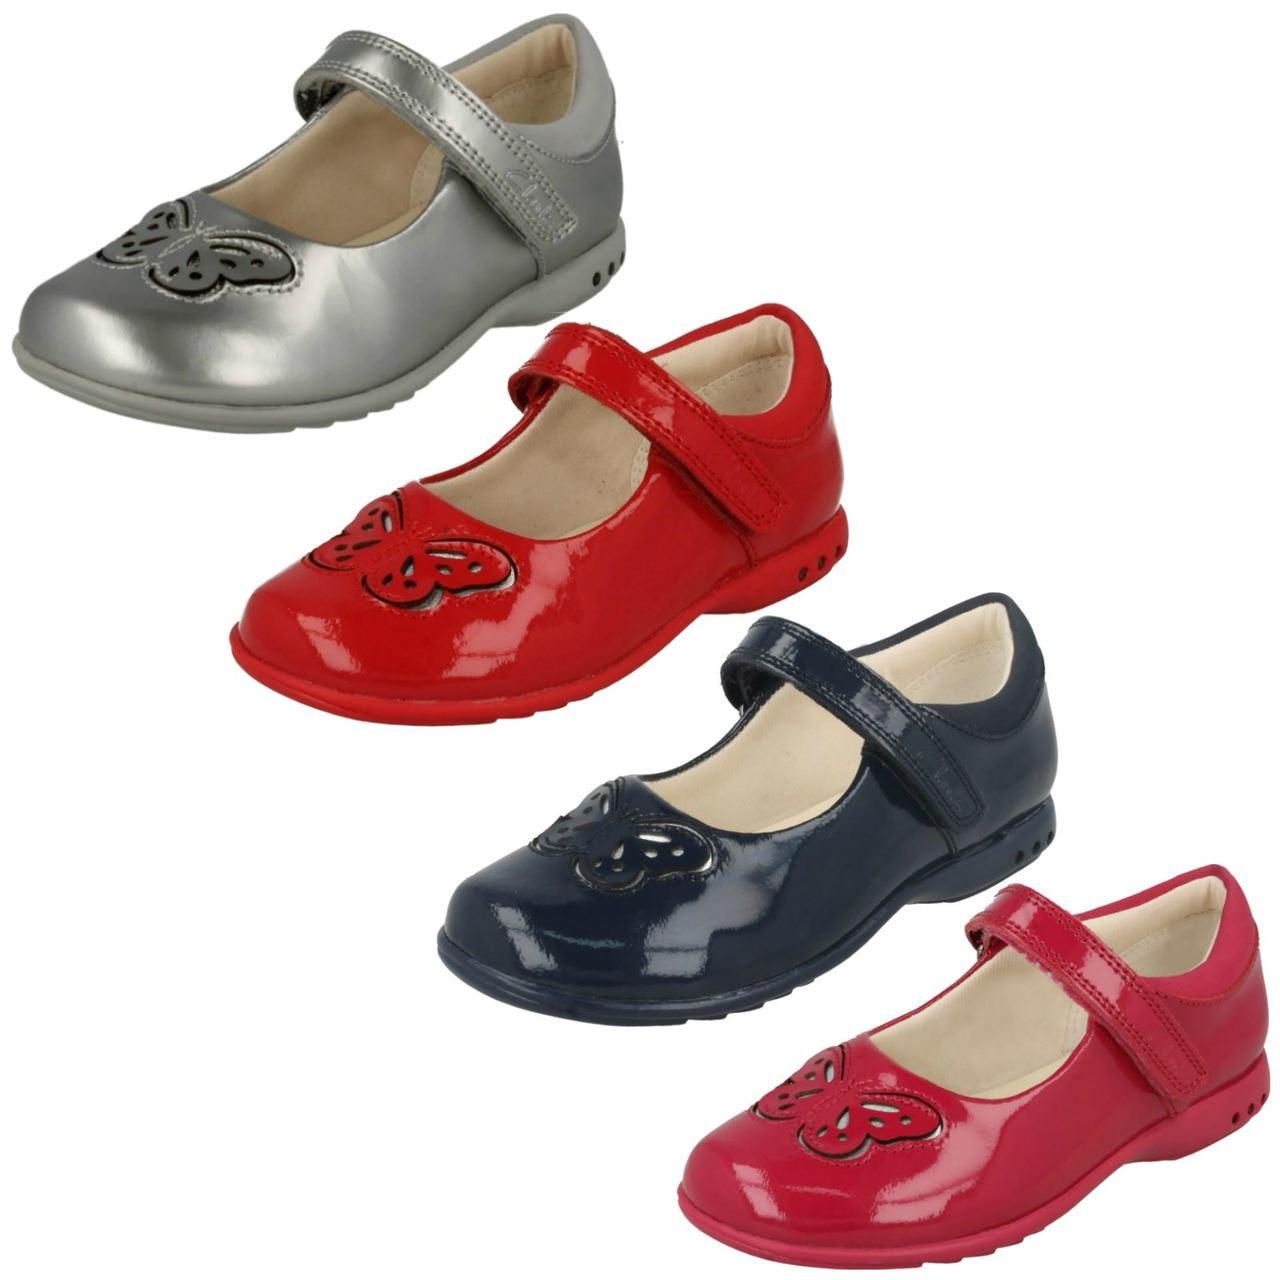 Girls Clarks Light Up Shoes Trixi Wish